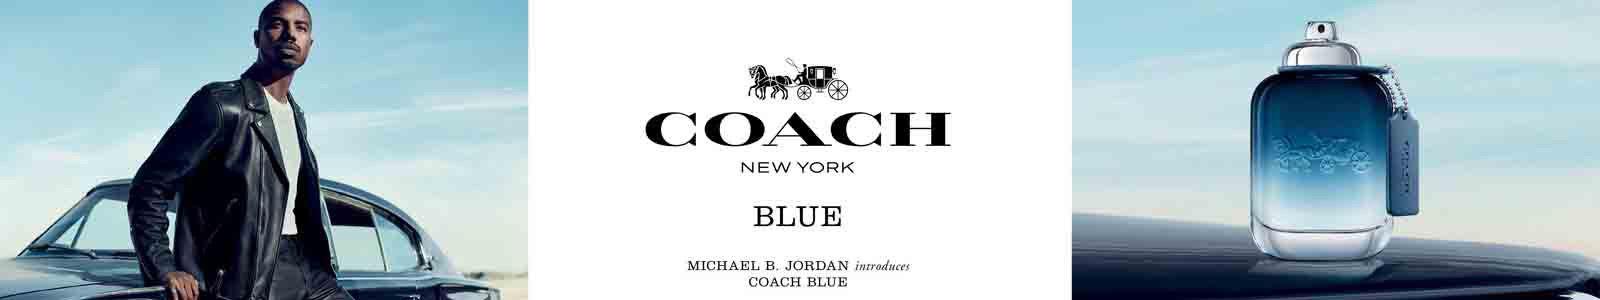 Coach, New York, Blue, Michael B Jordan, Coach Blue